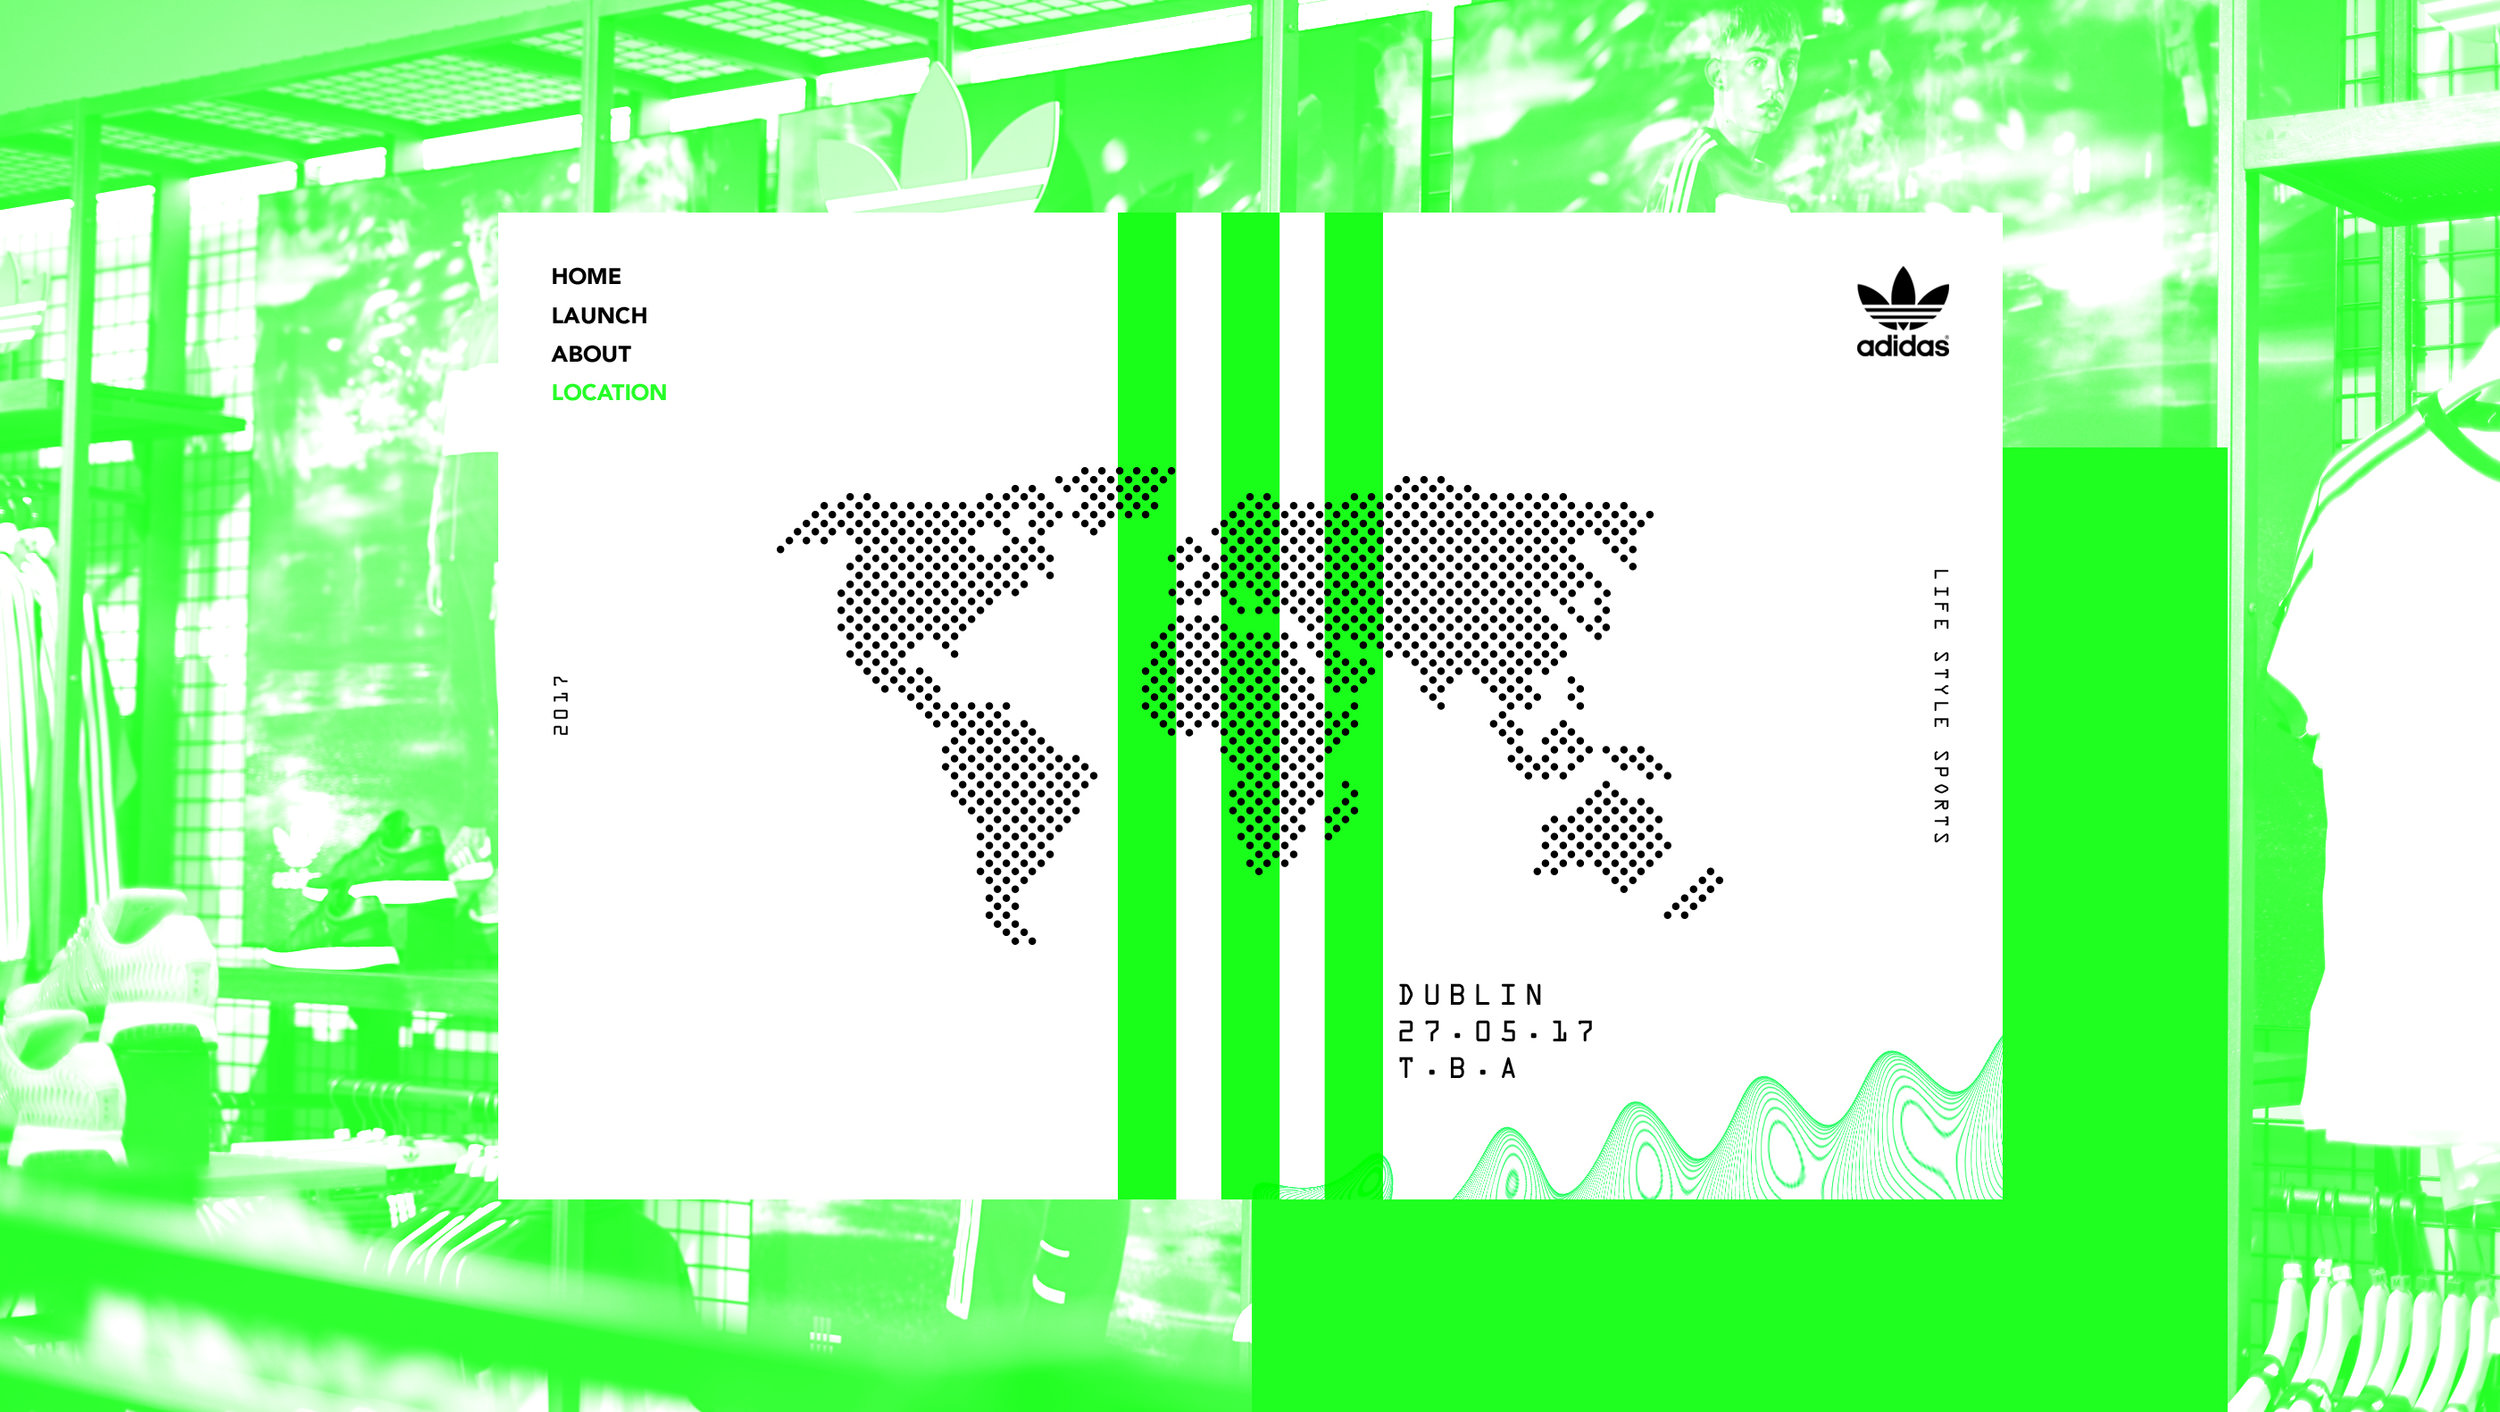 para justificar Detenerse Derribar  Dublin Grafik Co.—Adidas Original | Campaign Design | Content Creation